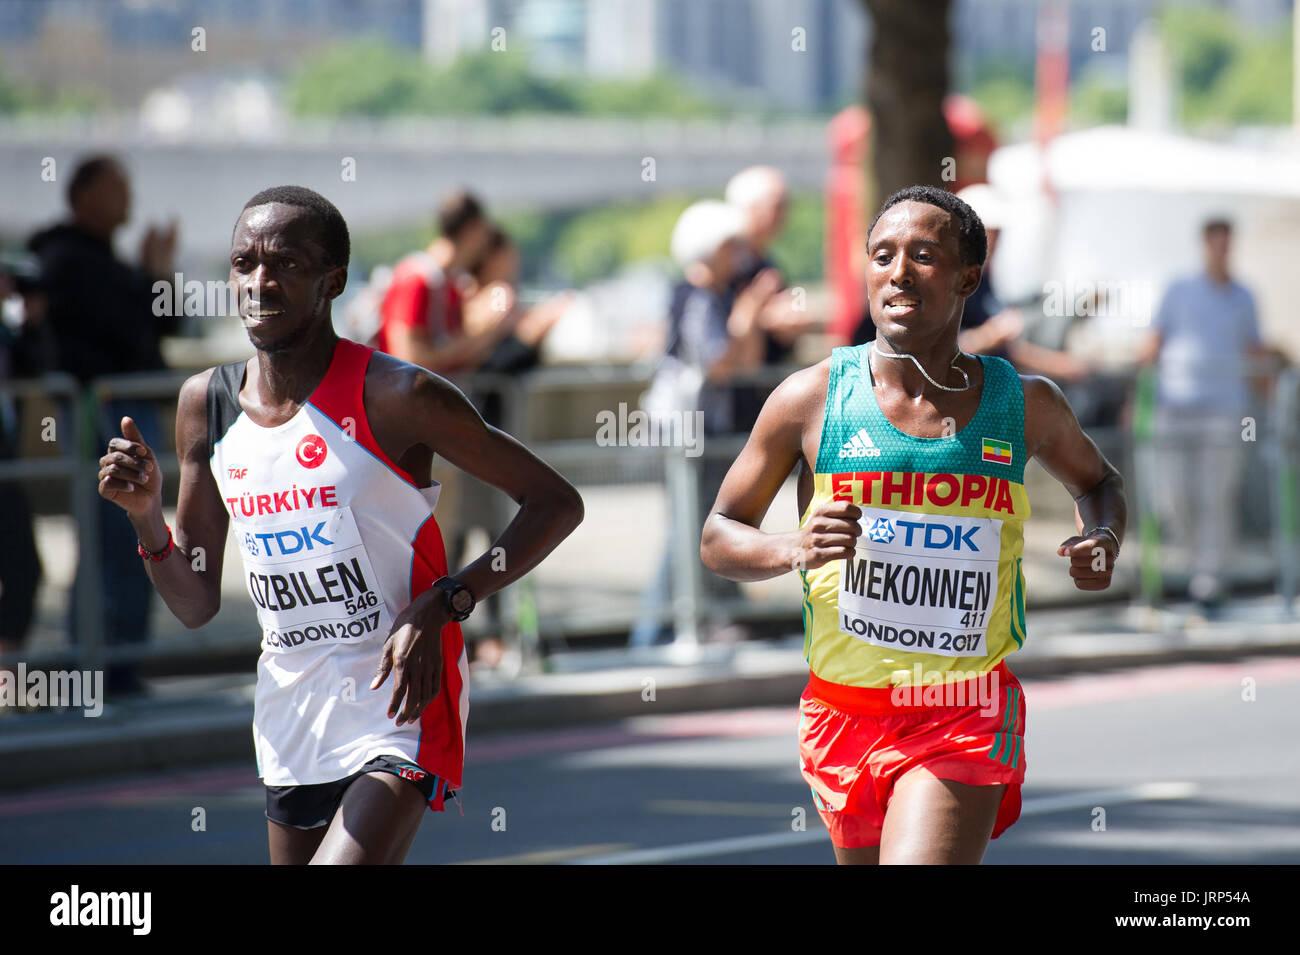 London, UK. 6th August, 2017. Kaan Kigen Ozbilen (Turkey) and Tsegaye Mekonnen (Ethiopia) at the IAAF World Athletics Championships Men's Marathon Race Credit: Phil Swallow Photography/Alamy Live News - Stock Image